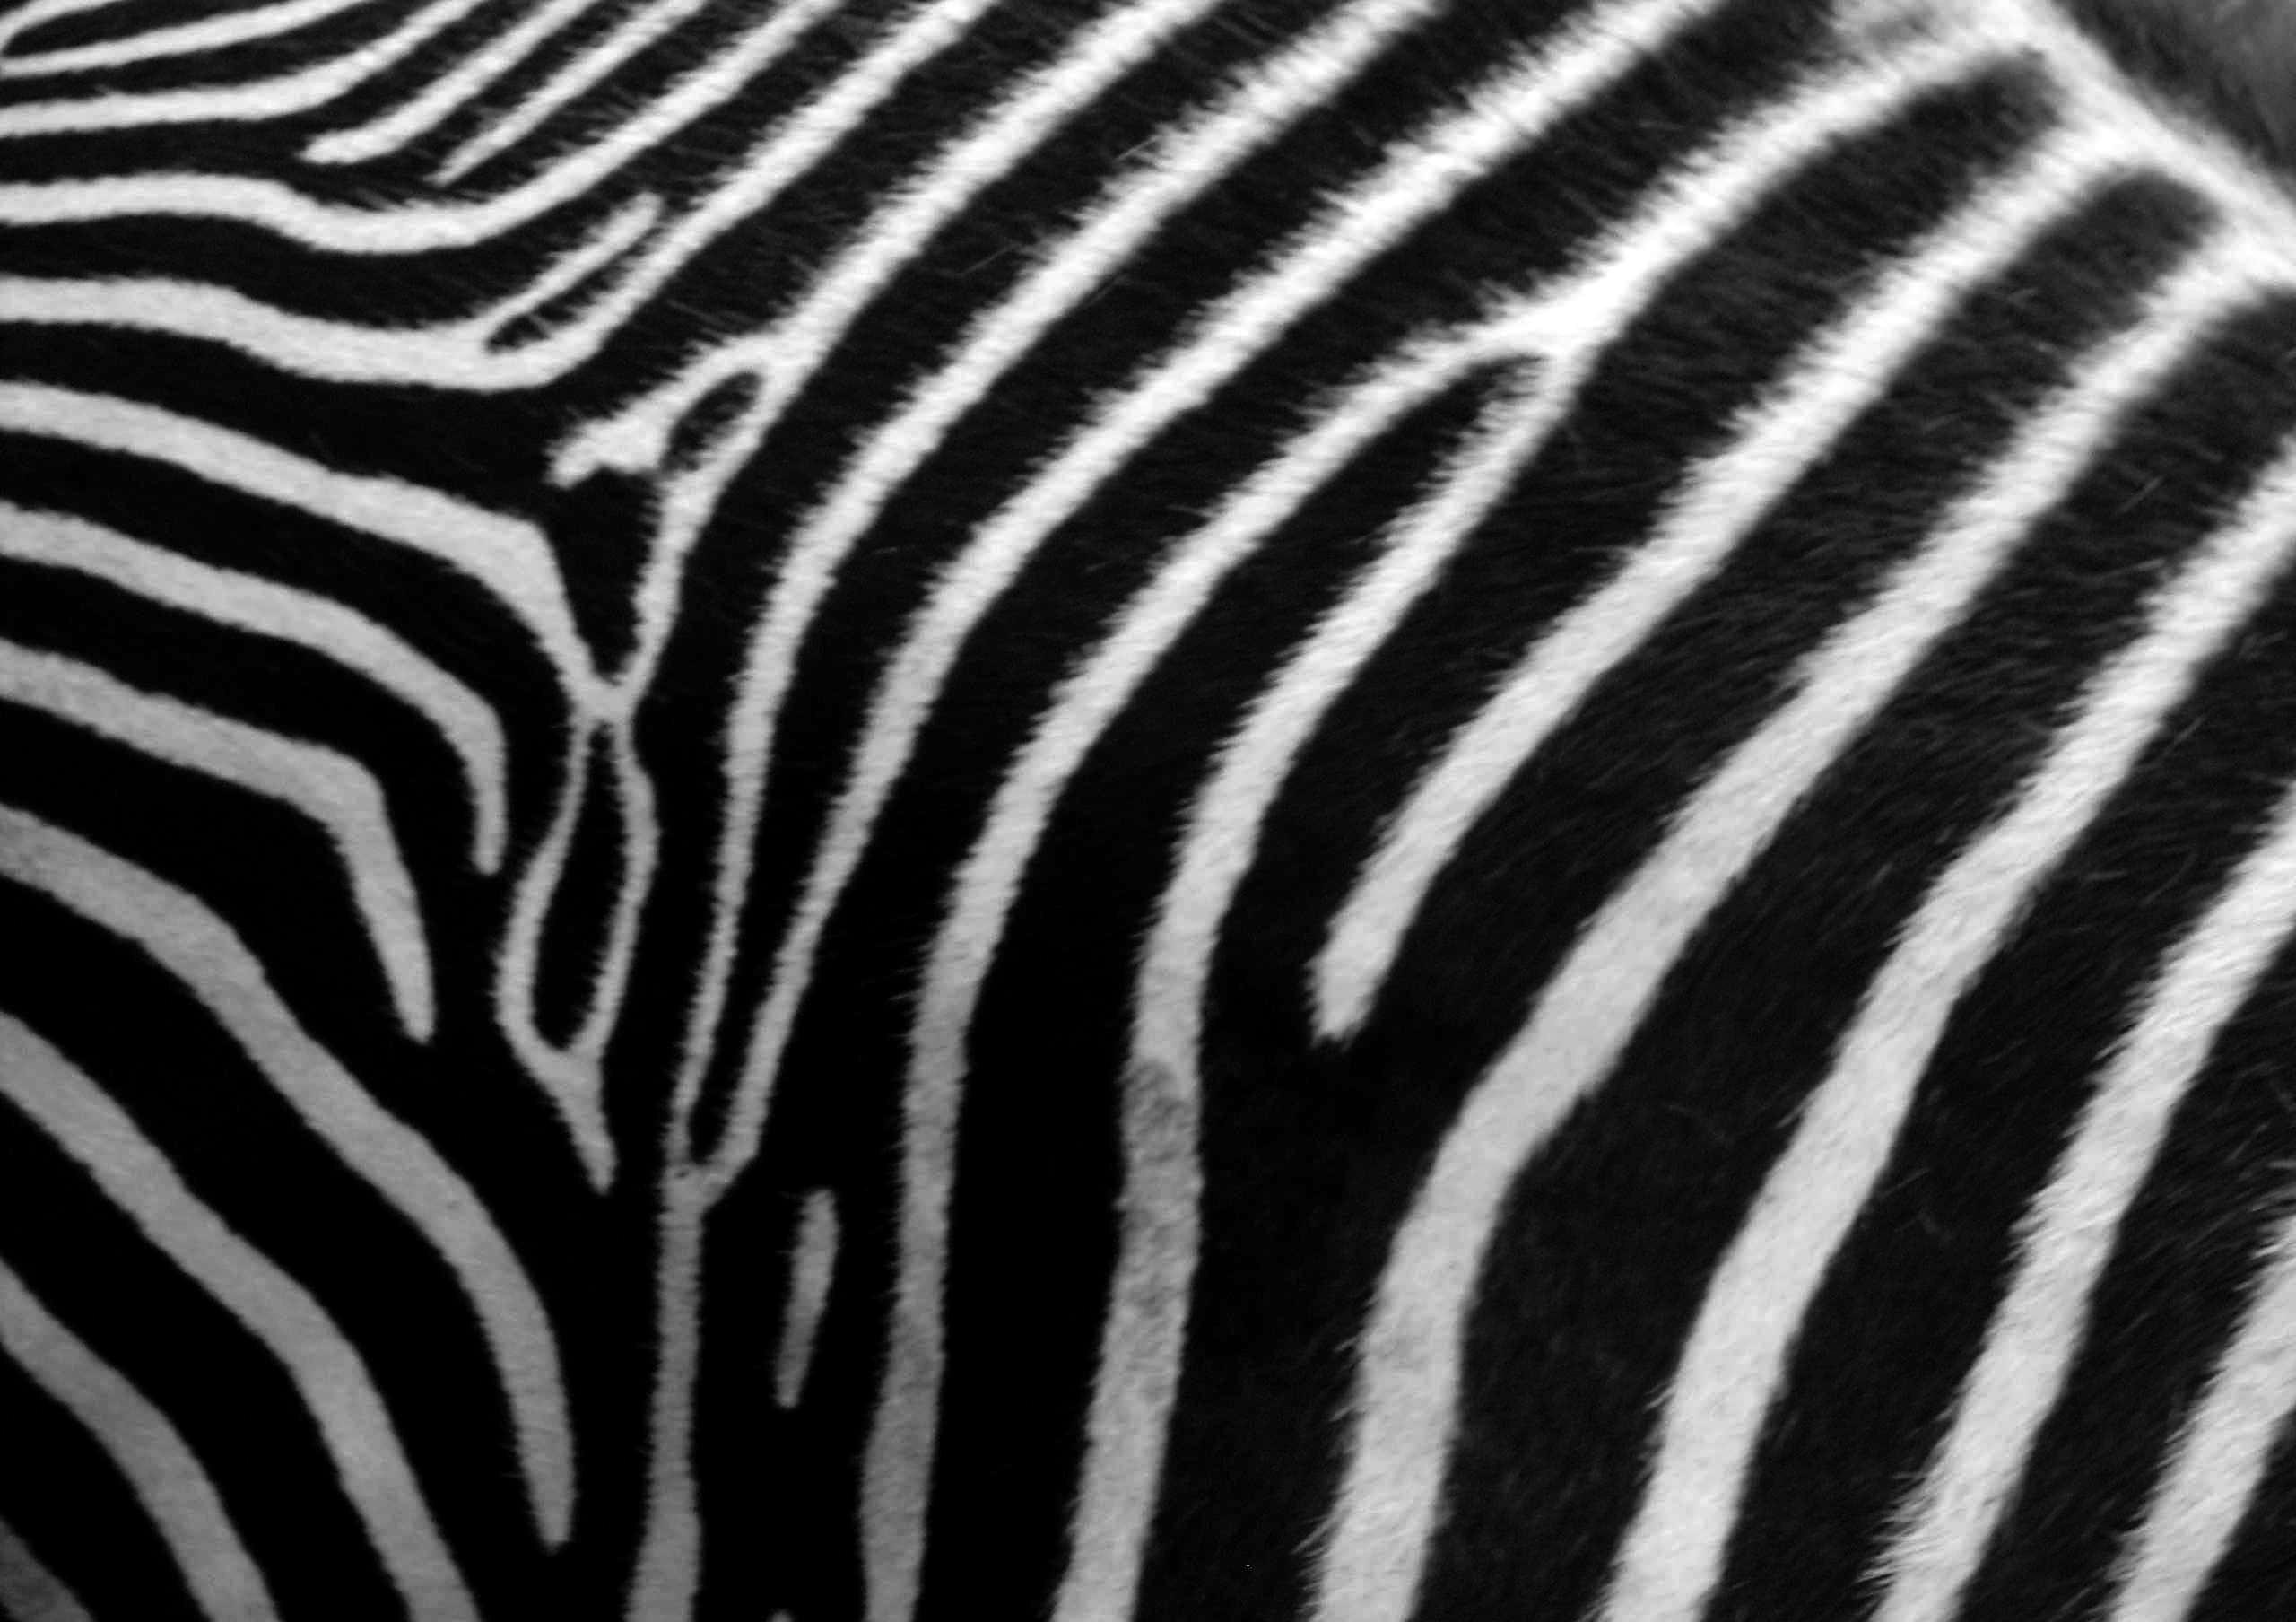 Neon Animal Print Wallpaper Zebra Print Wallpaper Hd Pixelstalk Net